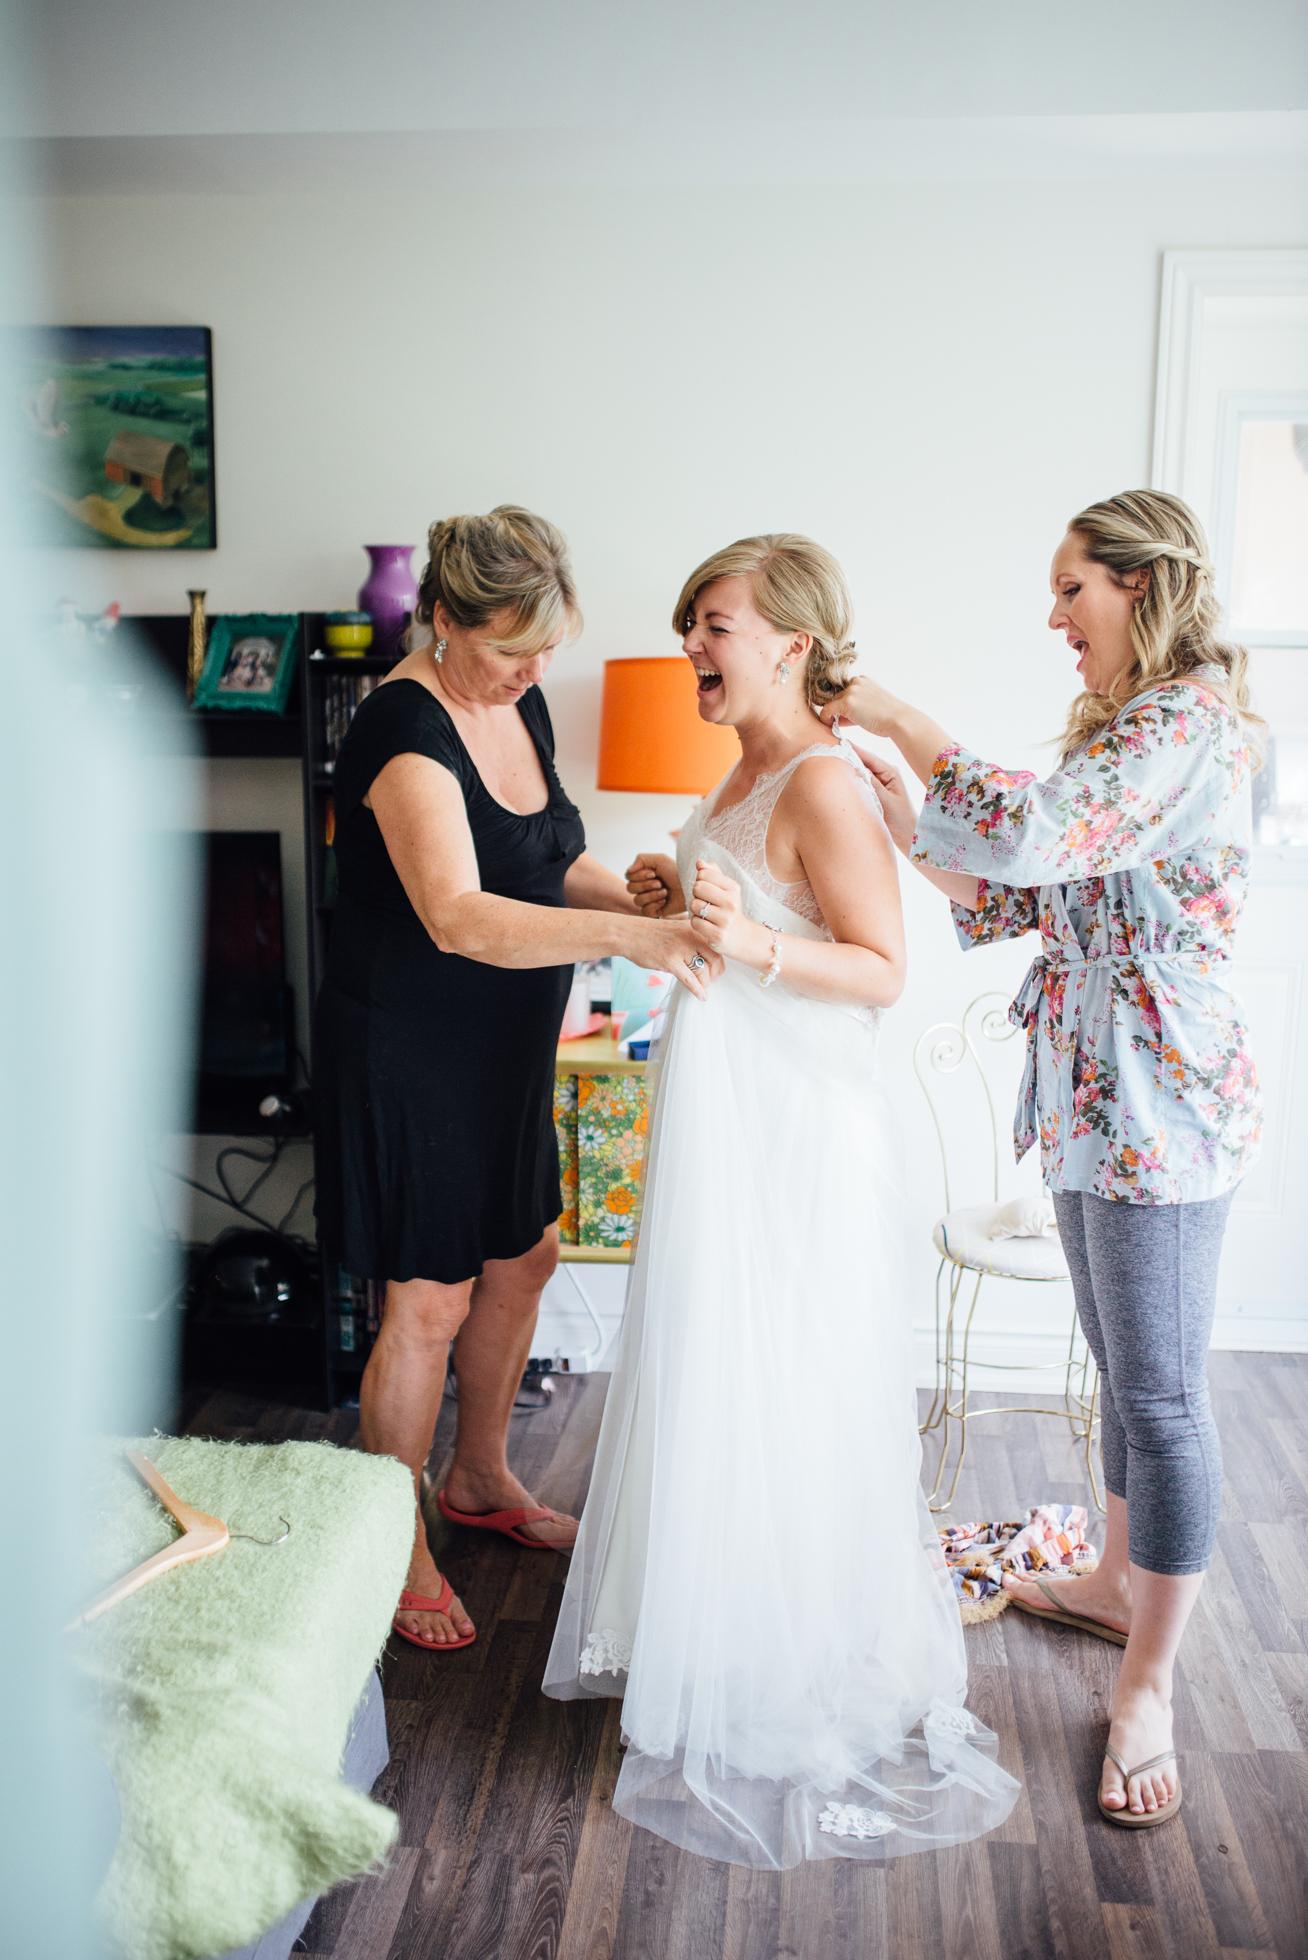 Outdoor-Caledon-Tralee-Wedding-Photography-13